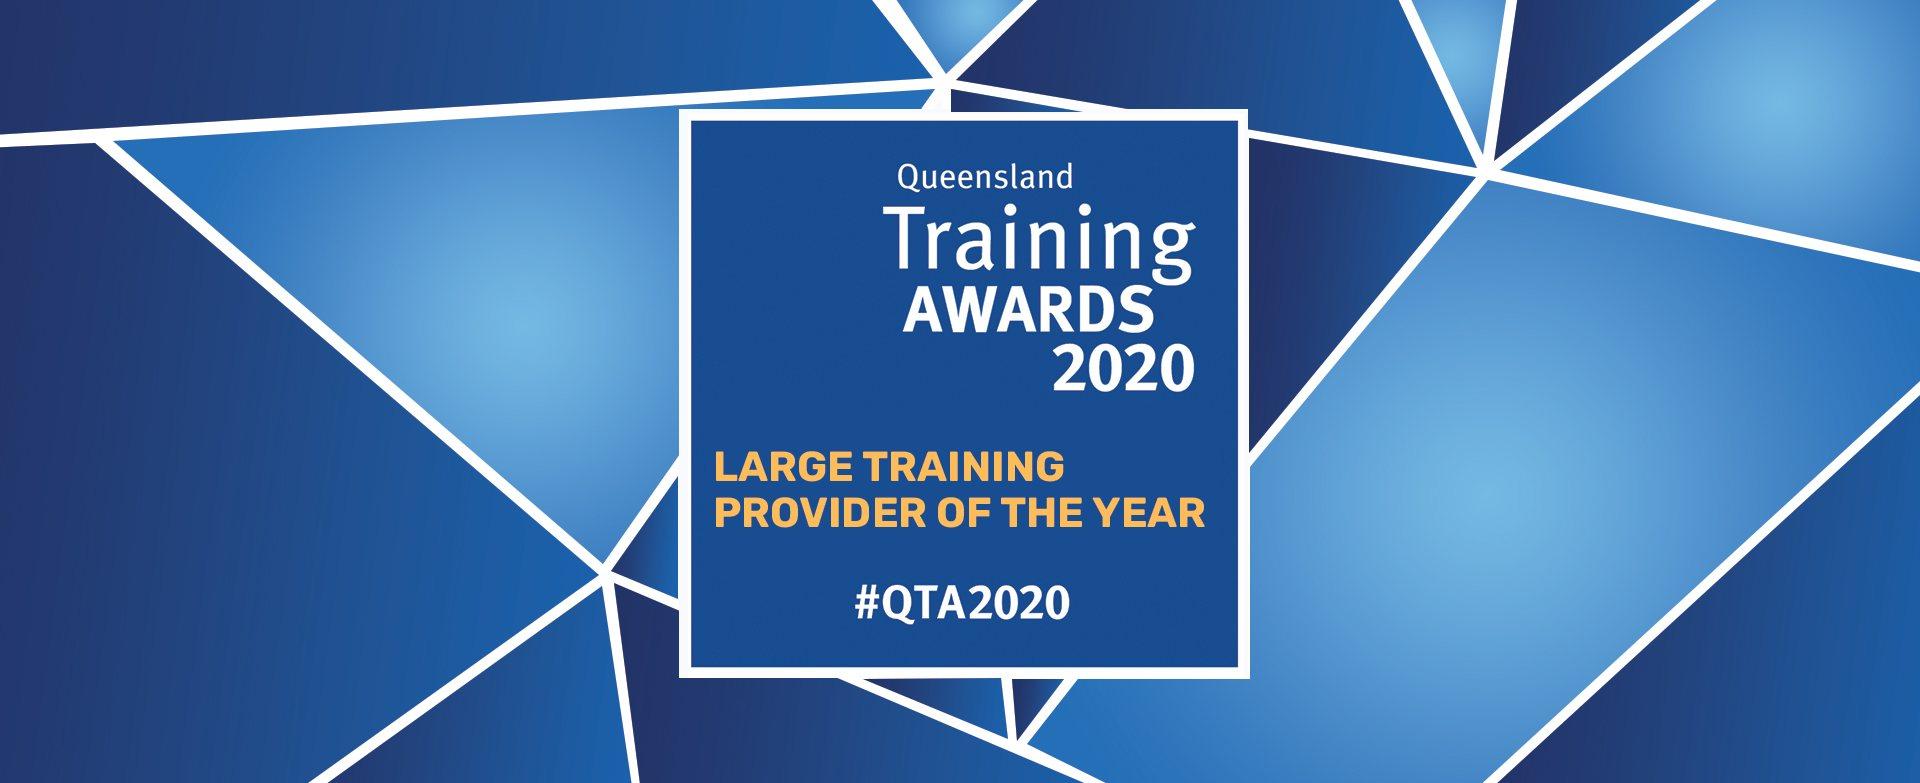 Queensland Training Awards 2020